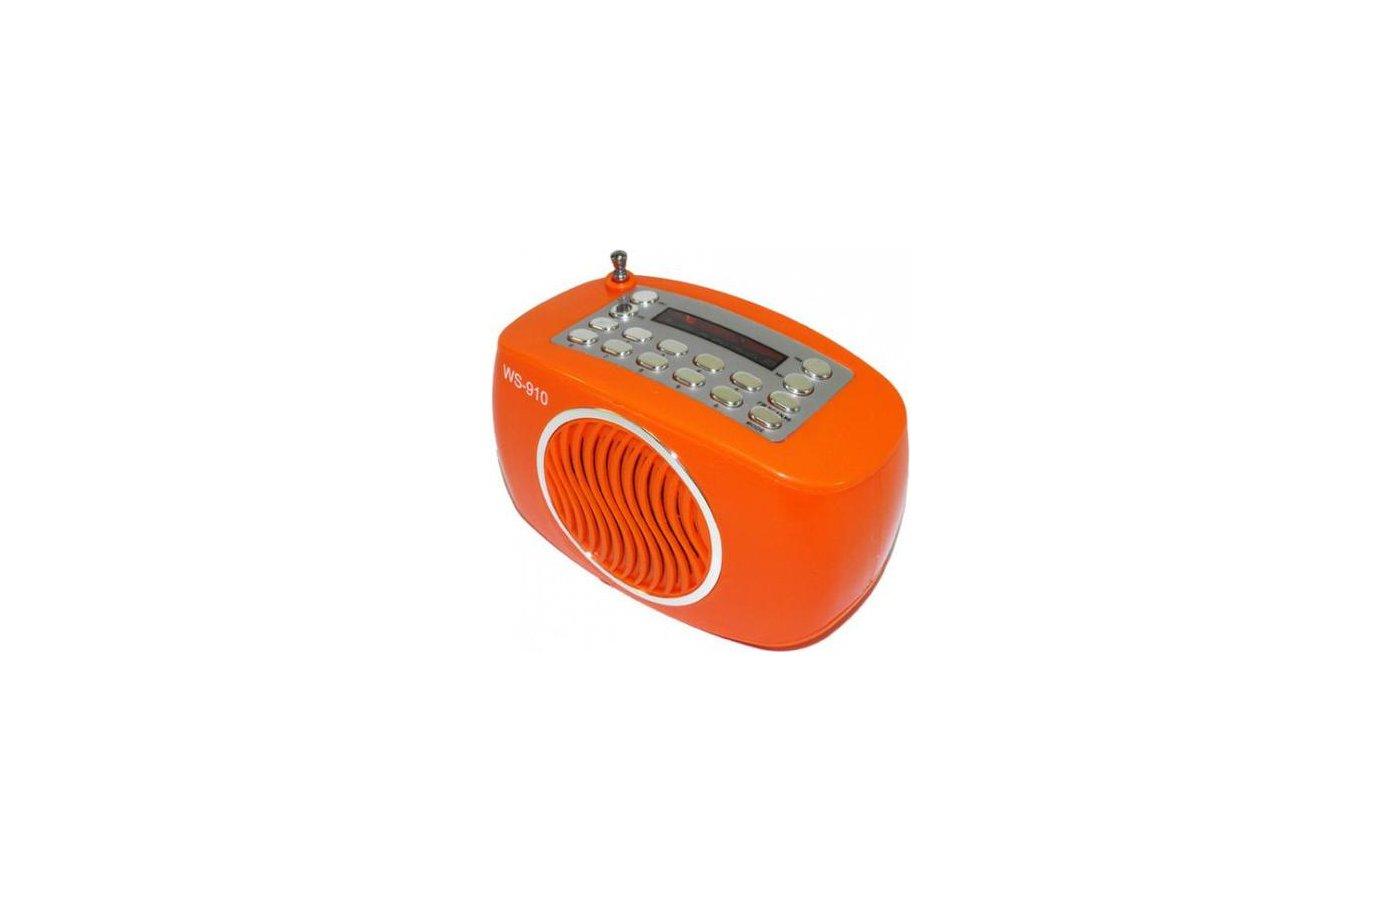 Колонка WSTER WS-910 оранжевая